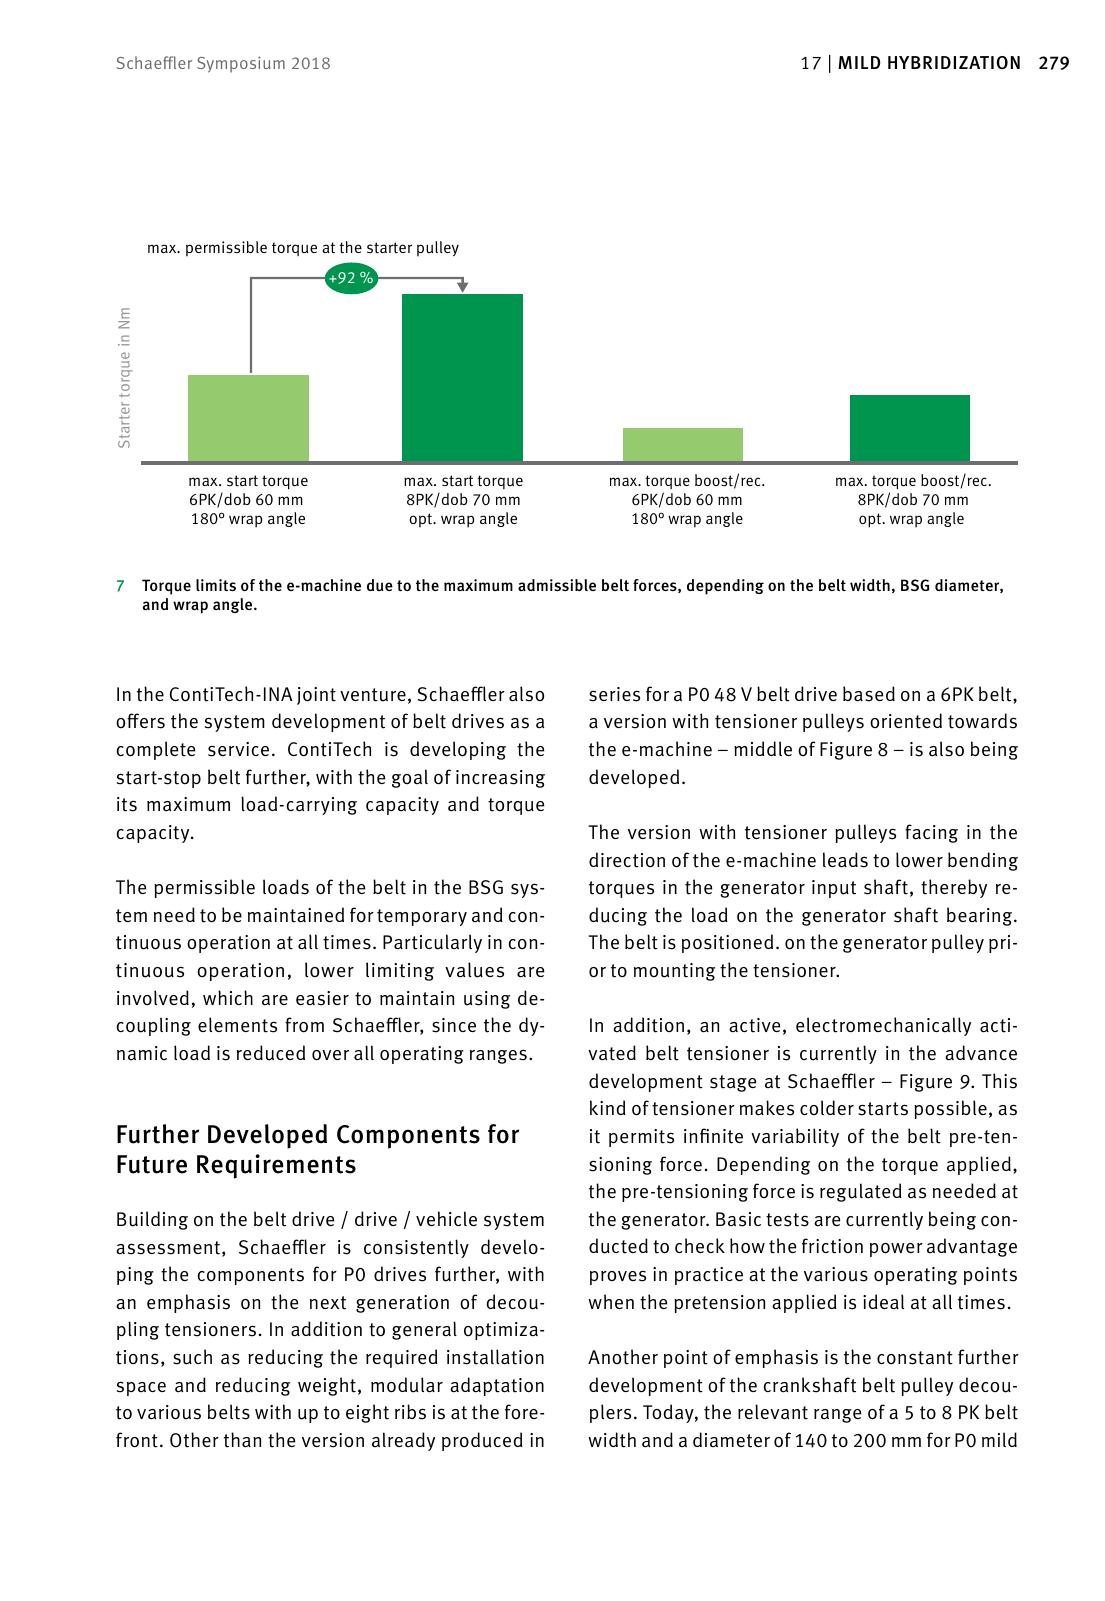 Ytl corporation annual report 2011